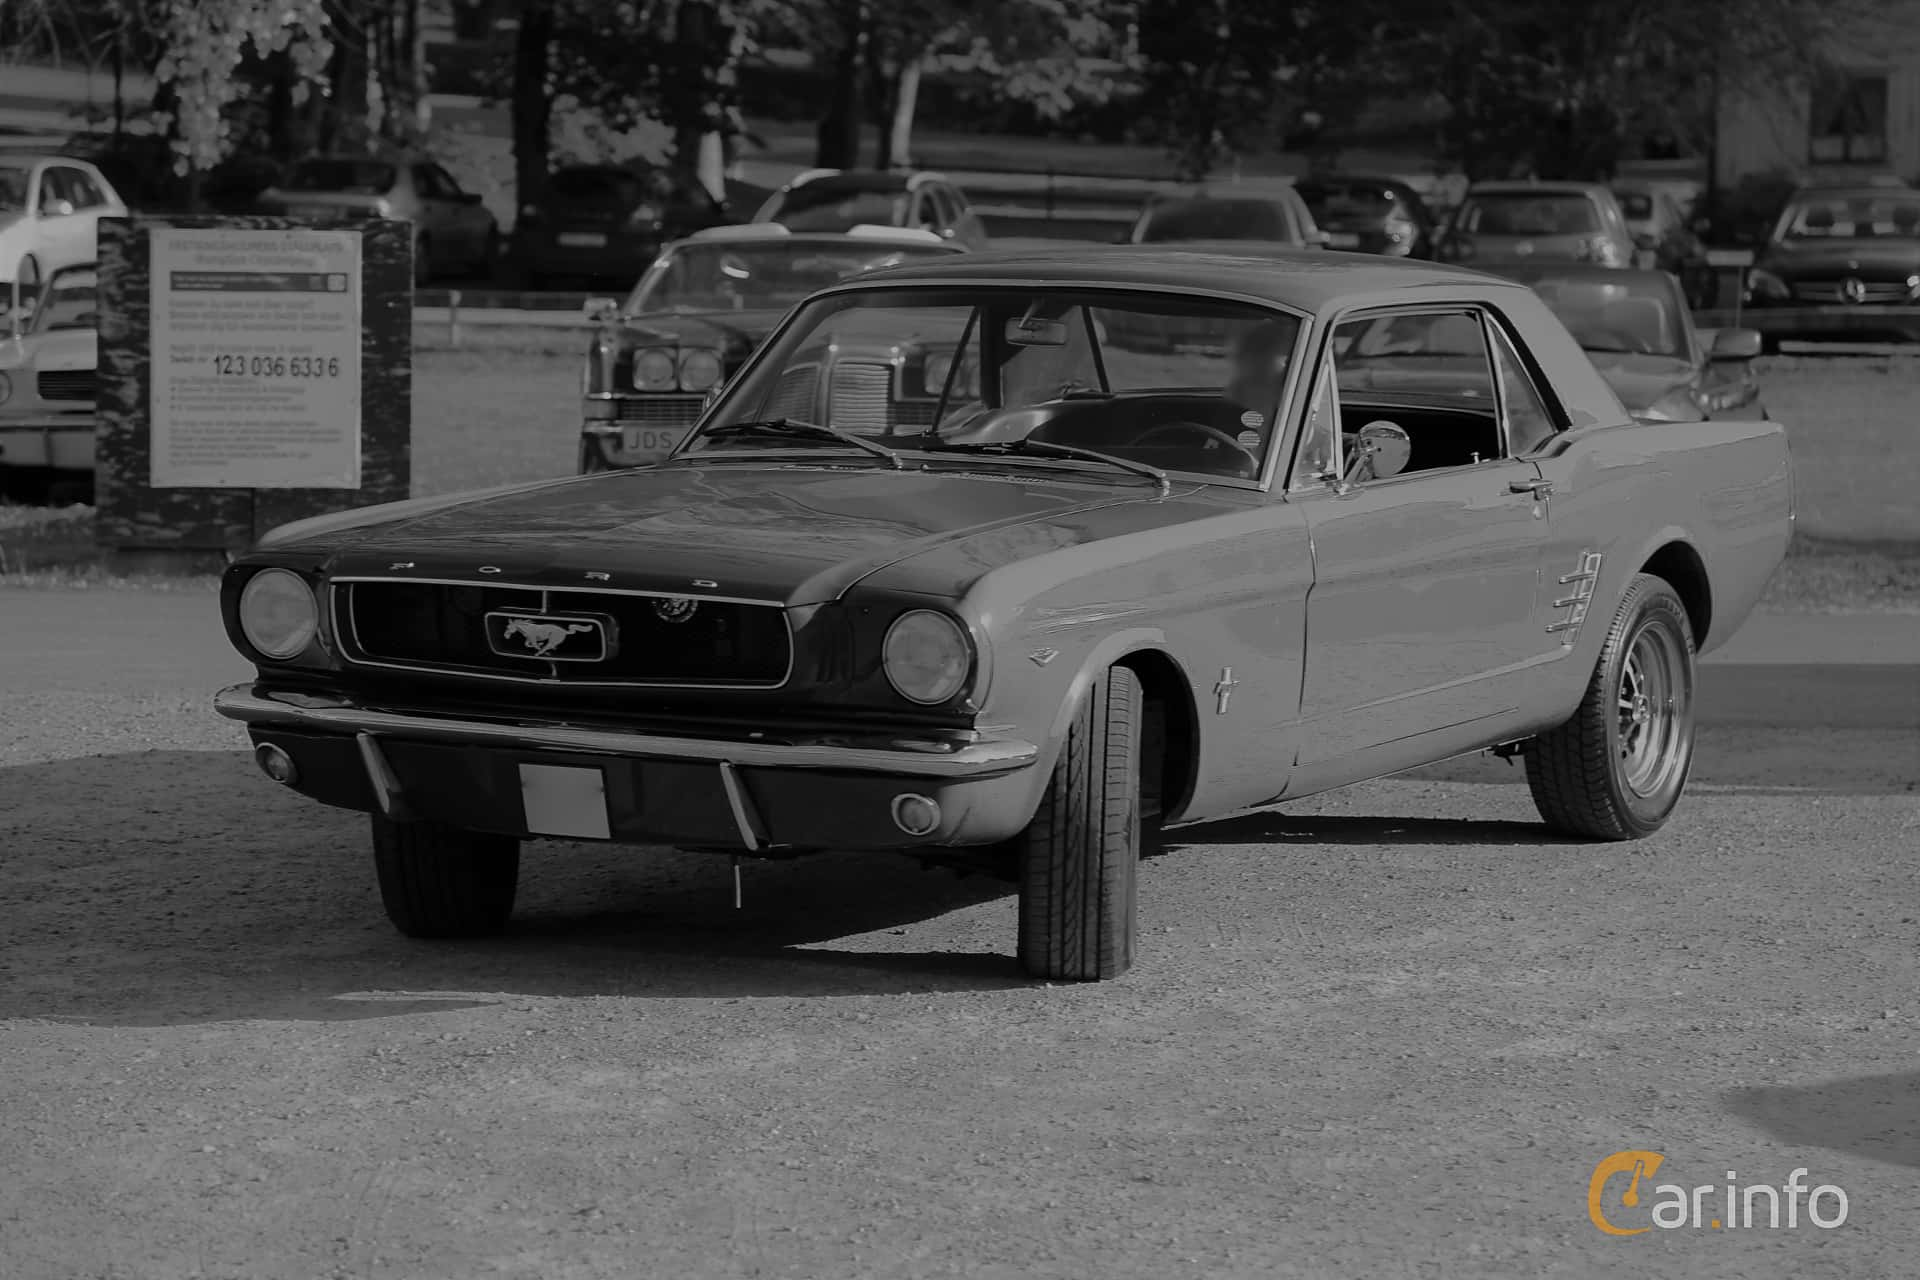 Ford Mustang Hardtop 4.7 V8 Automatic, 203hp, 1966 at KungälvsCruisingen 2017